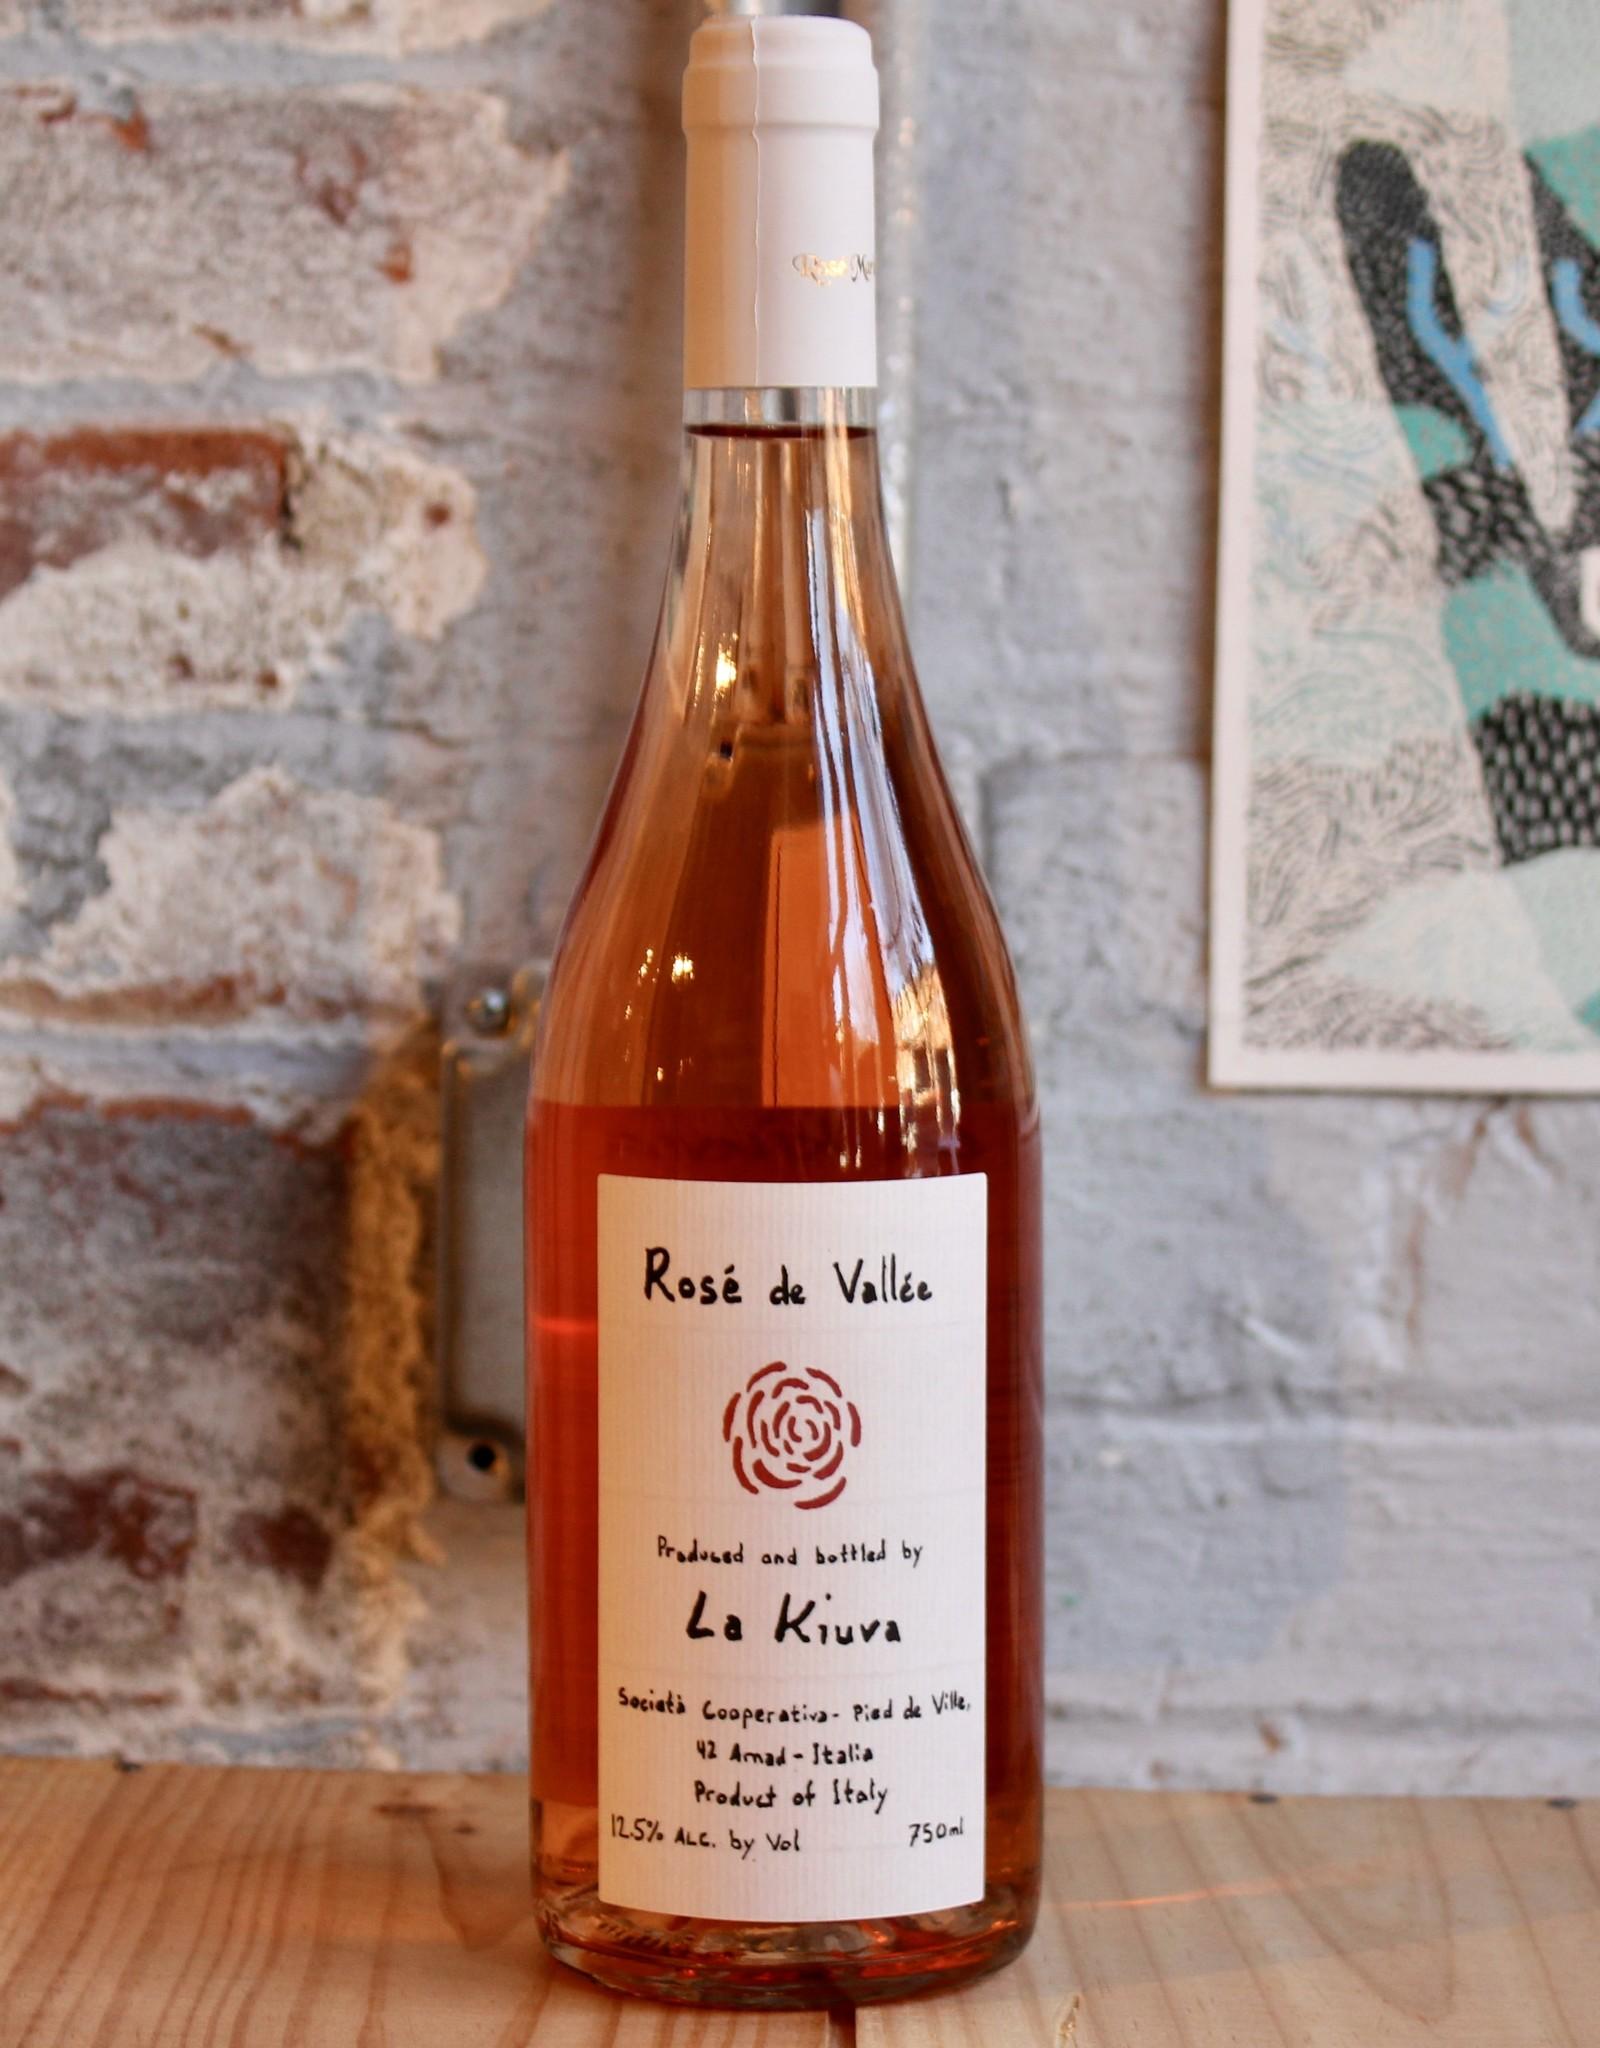 Wine NV La Kiuva Rosé de Vallee - Valle d'Aosta, Italy (750ml)